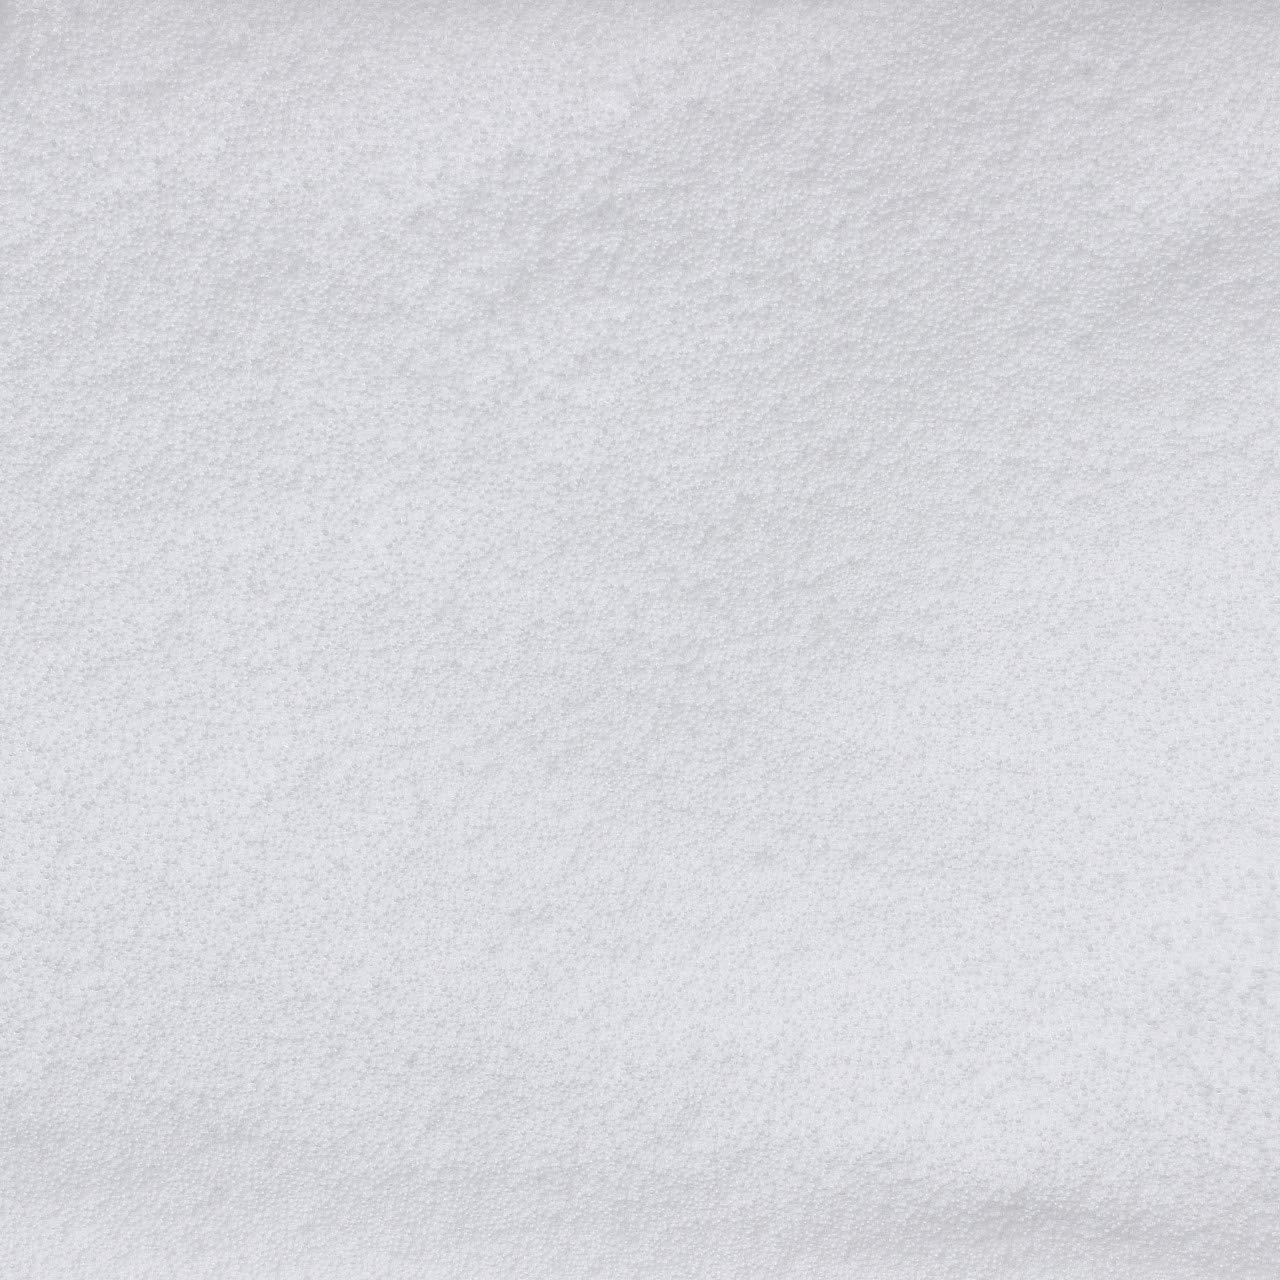 20 L kissenwelt.de Styropork/ügelchen MICRO Sandfein 0,5-1mm